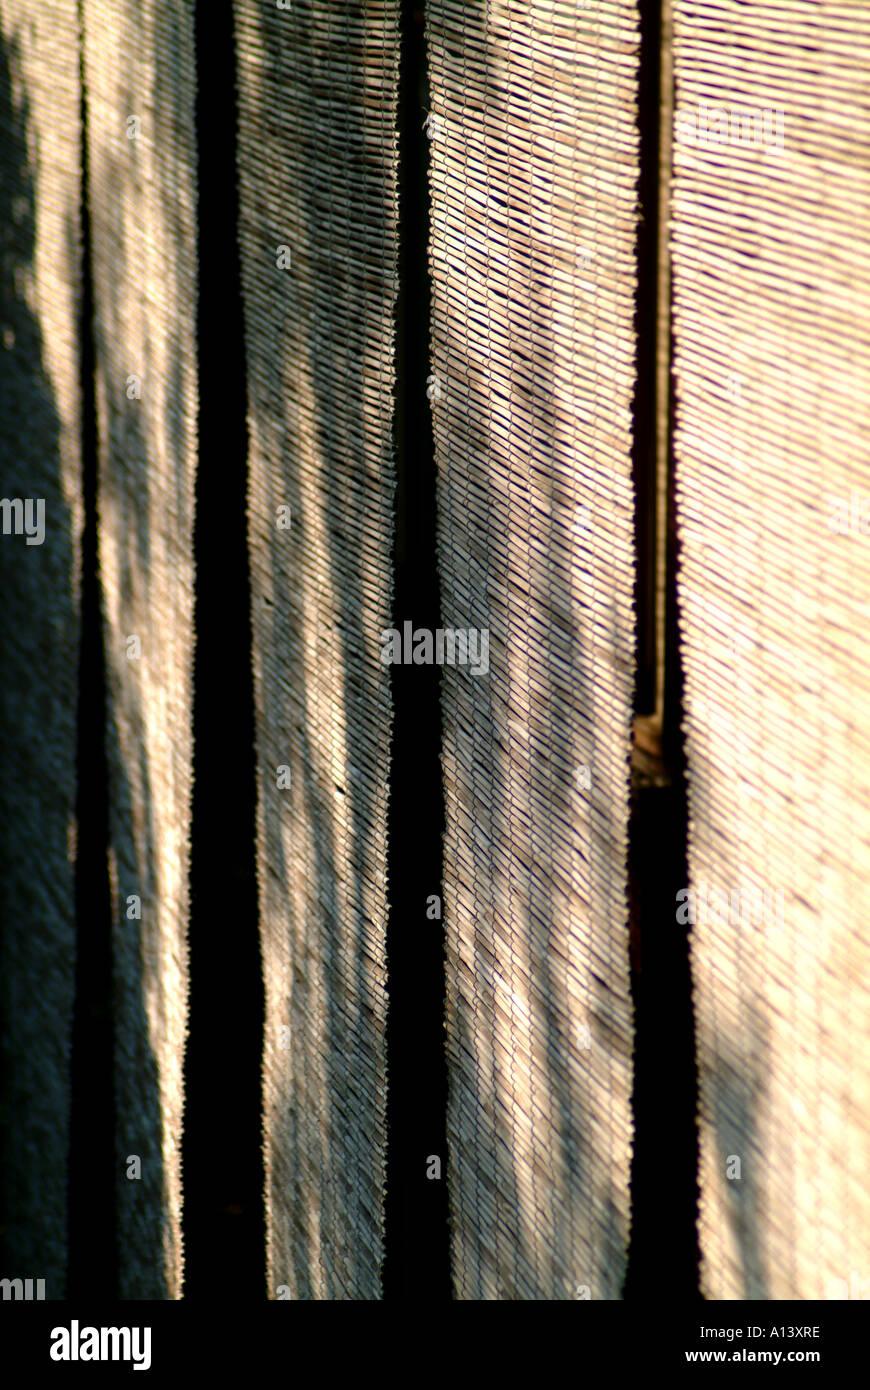 Bamboo sun screens at Zuiho-in within Daitokuji Temple Kyoto Japan - Stock Image